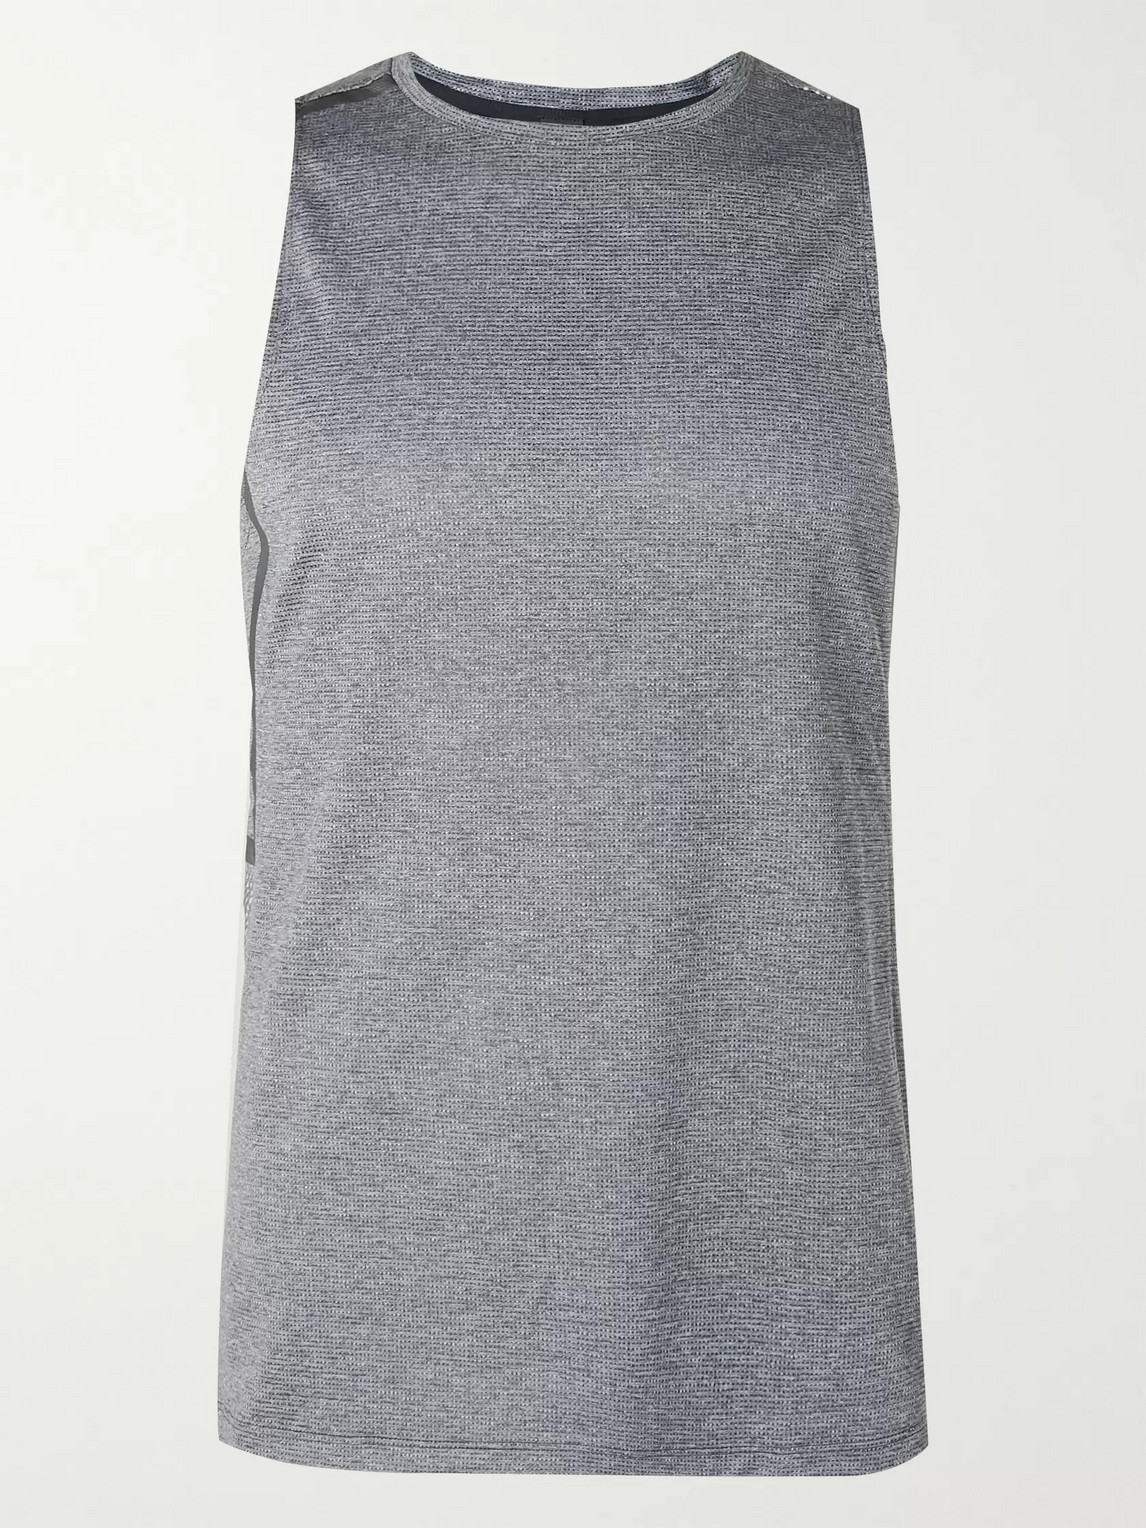 lululemon - fast and free mesh tank top - men - gray